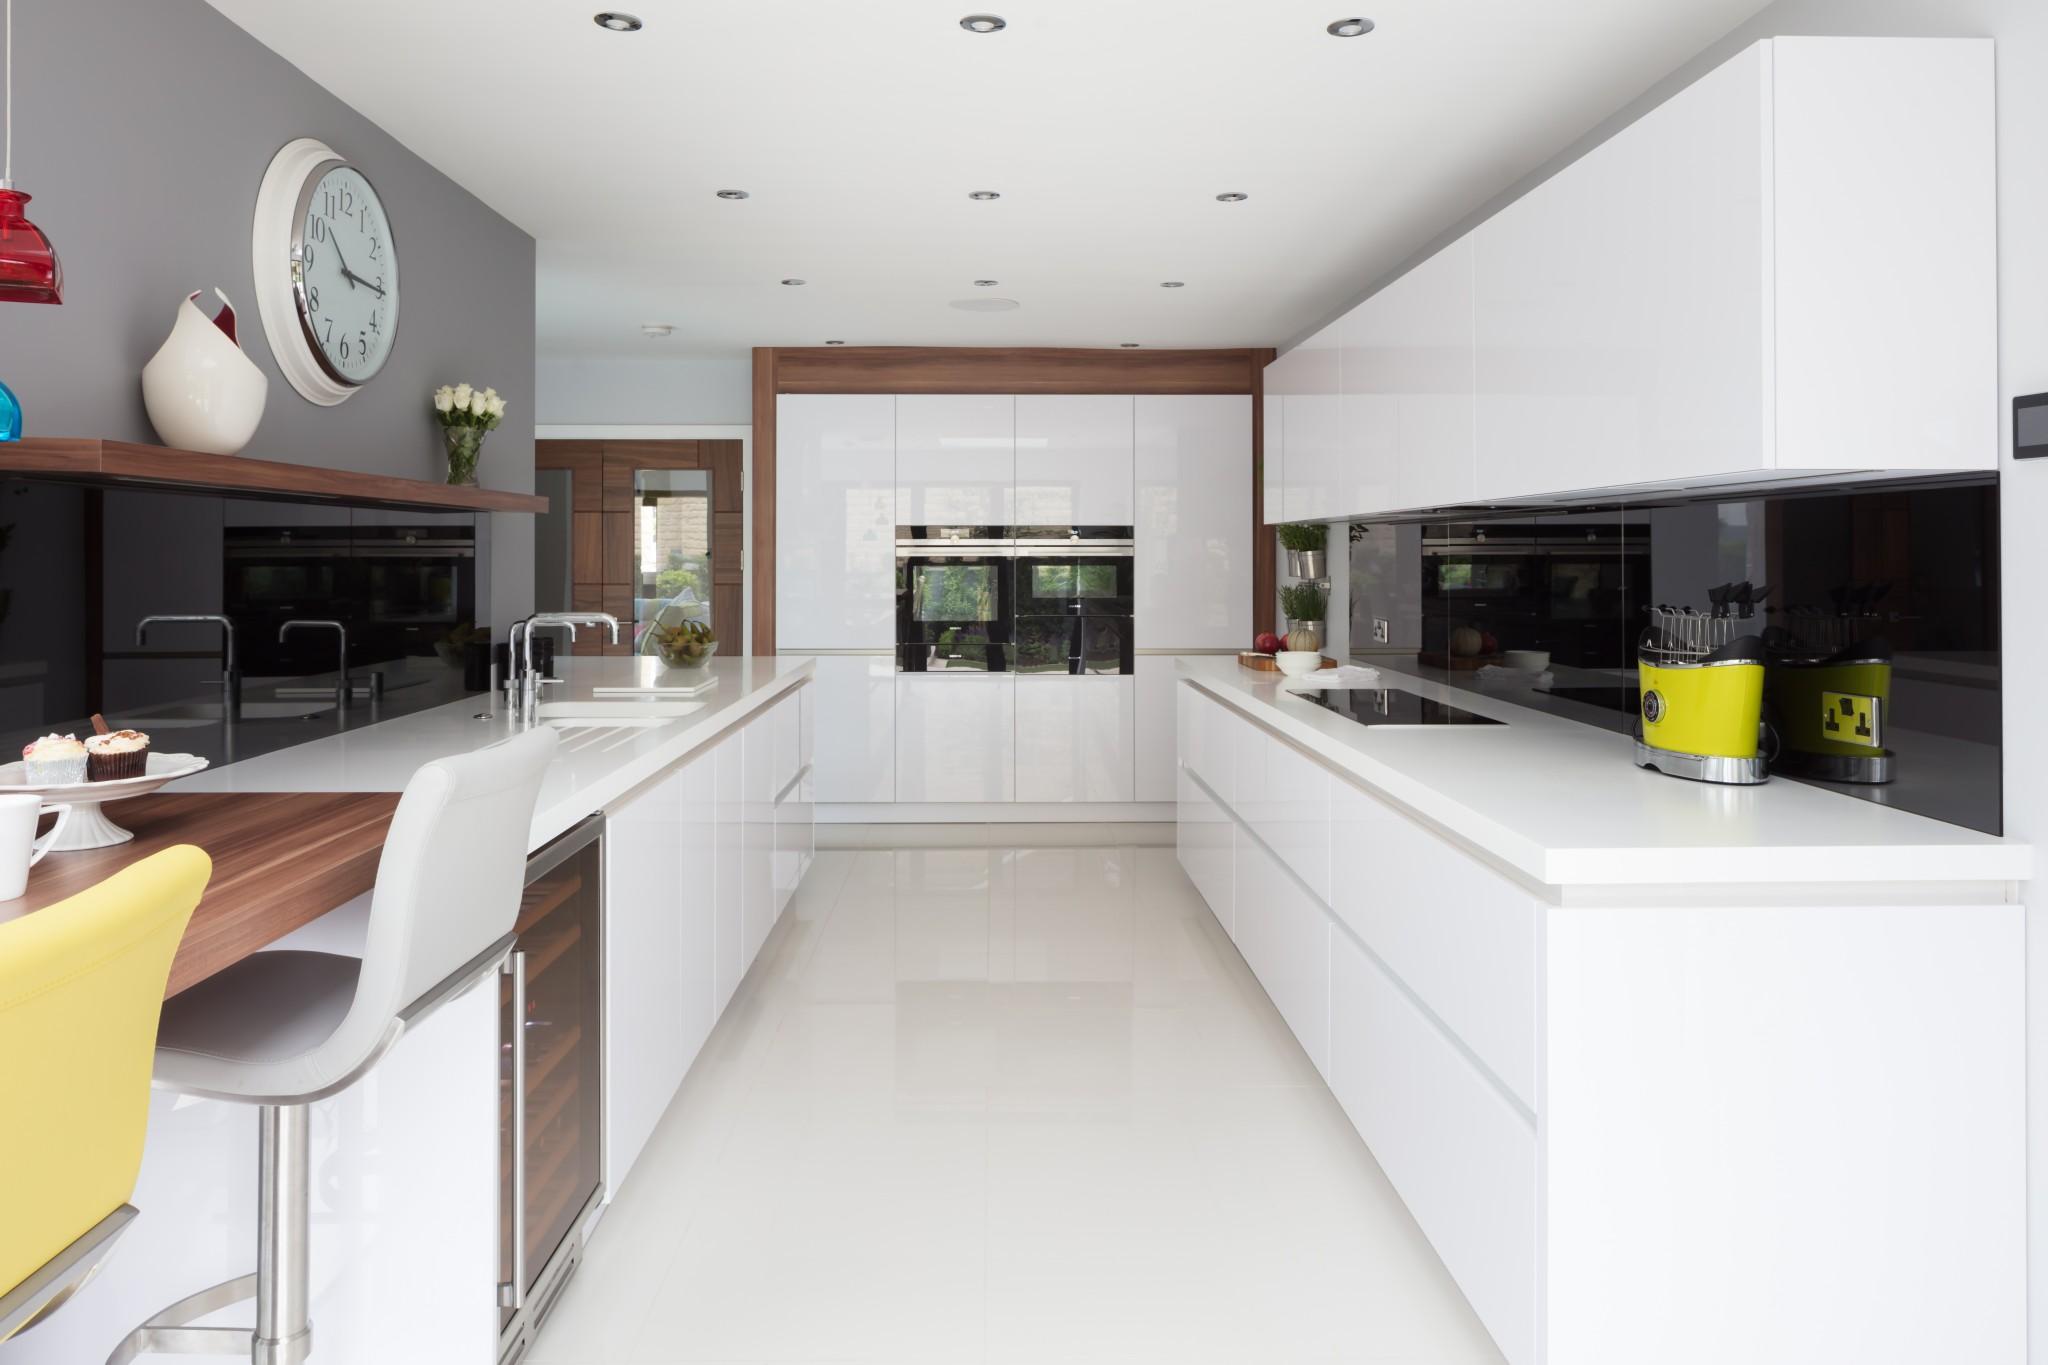 truKitchen bespoke Rempp kitchens